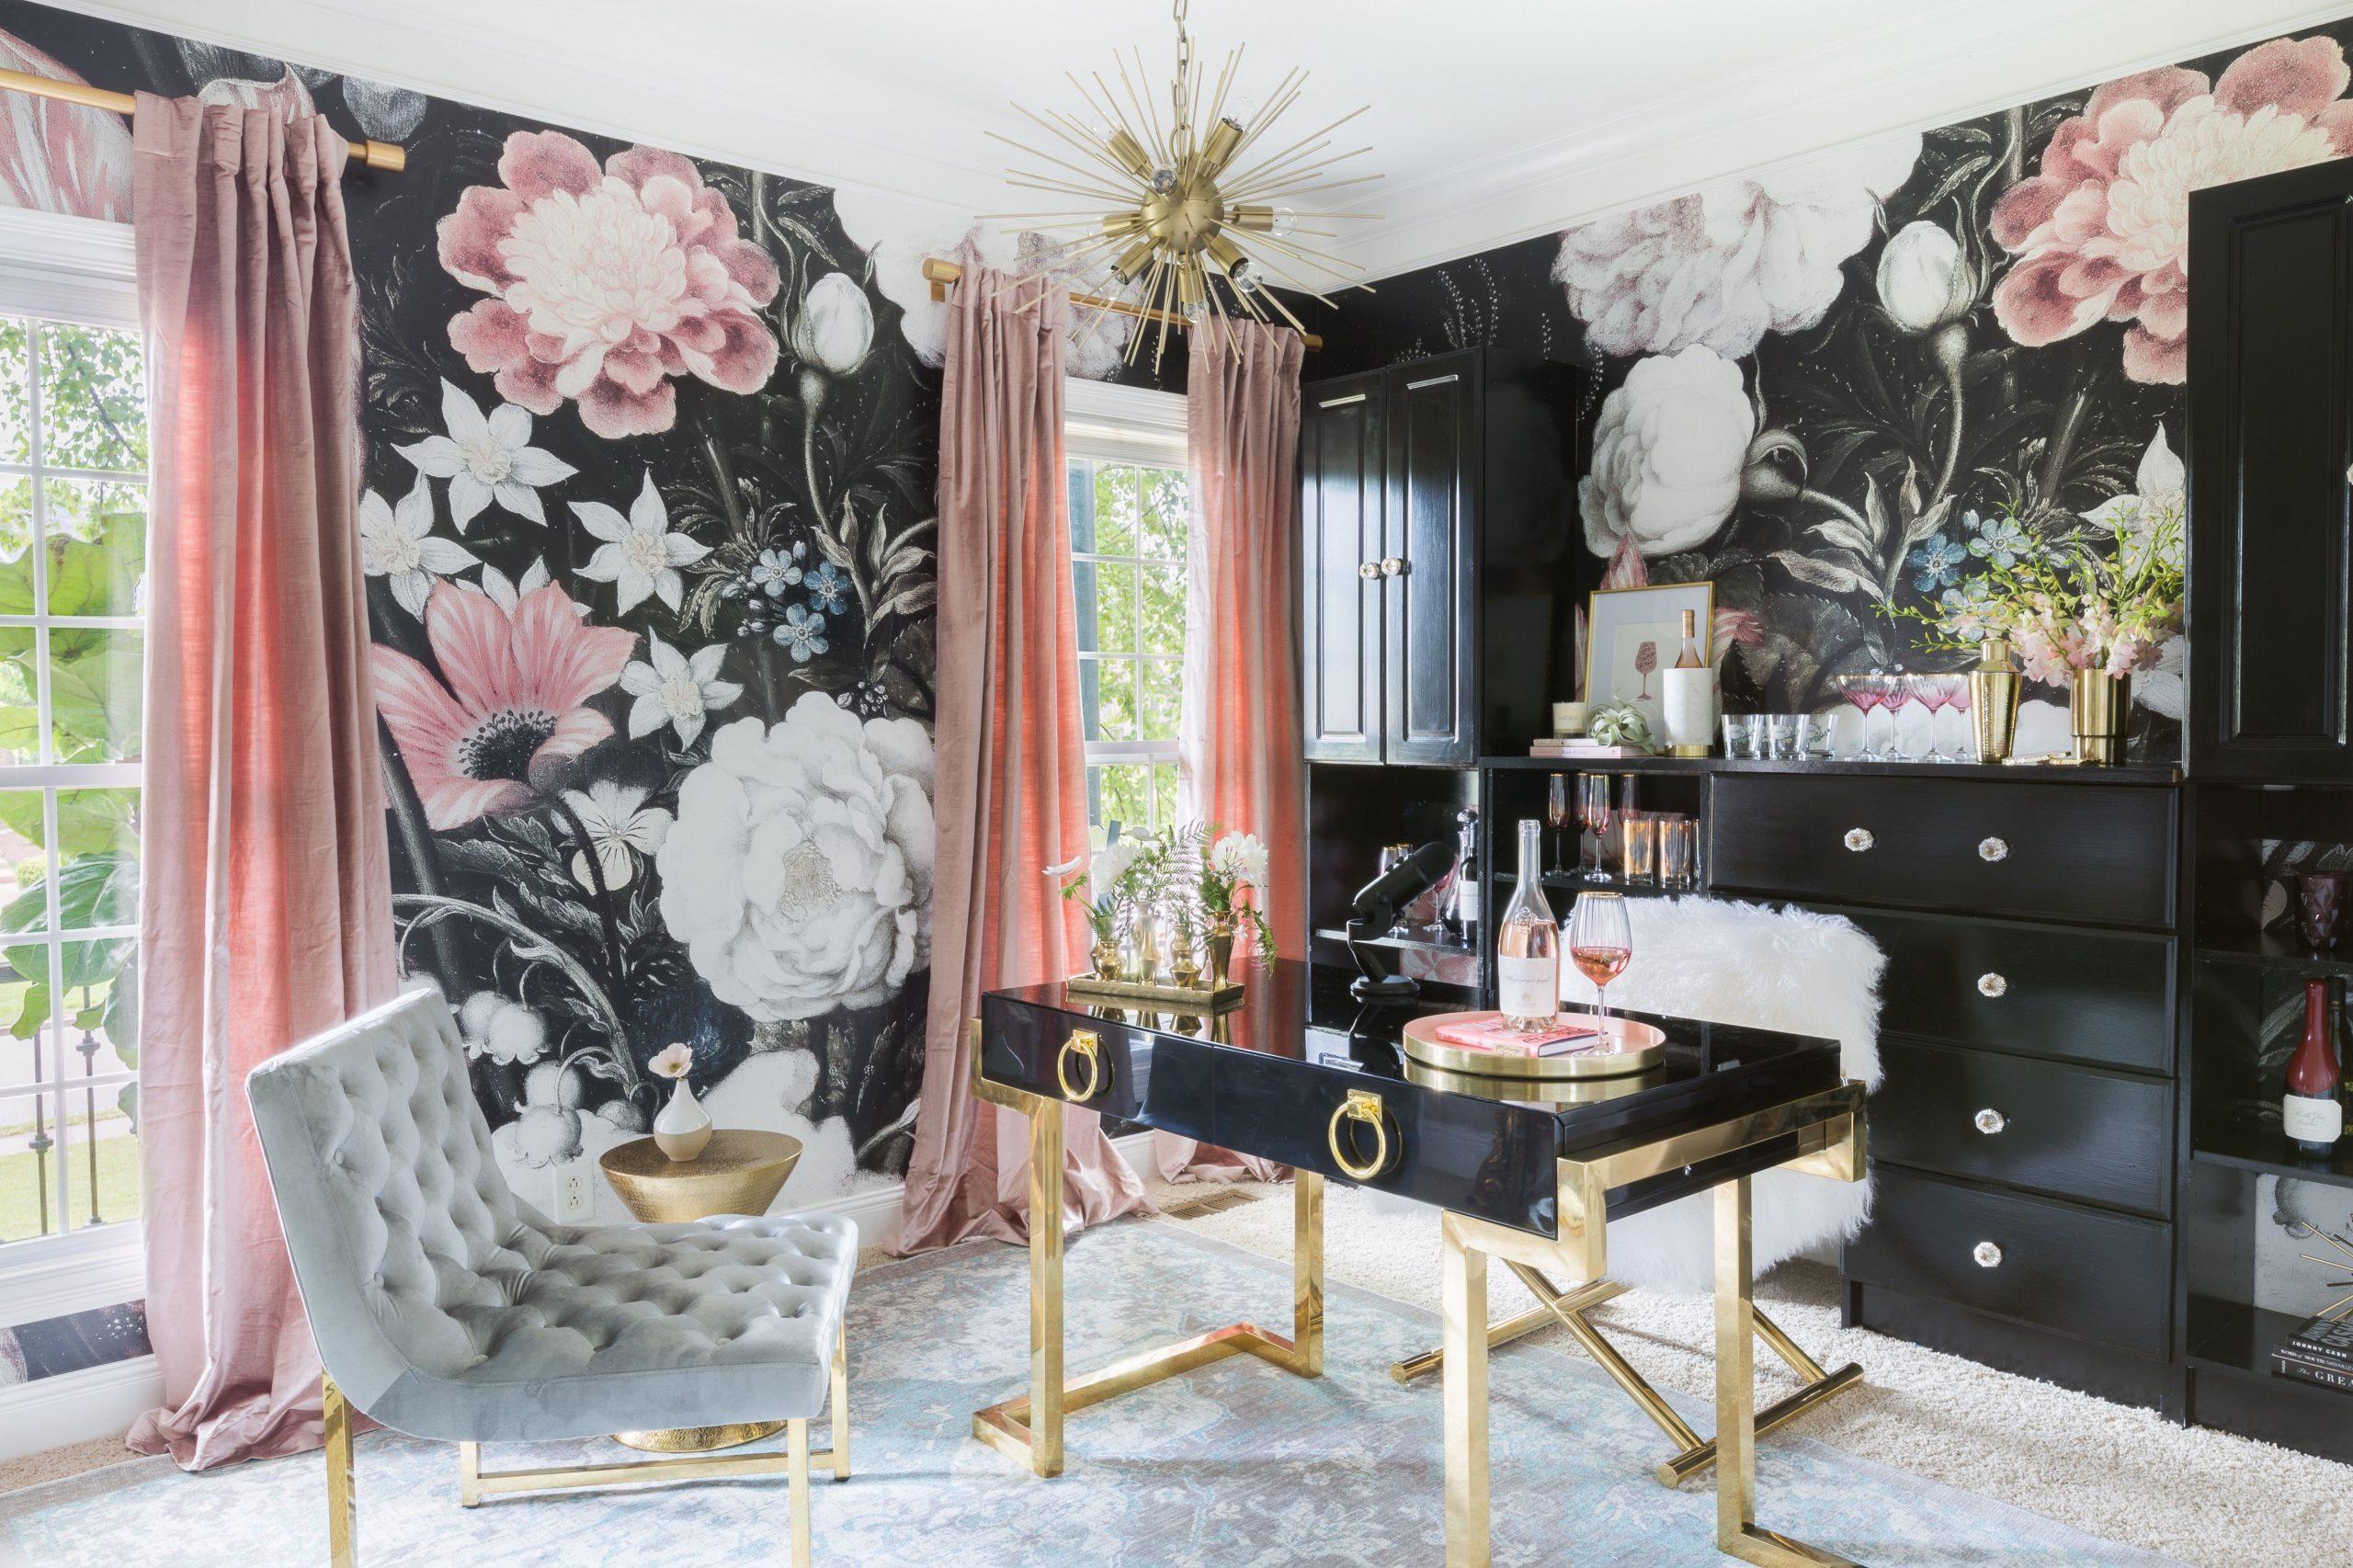 8 Best Home Office Decor Ideas - Home Office Ideas Cute